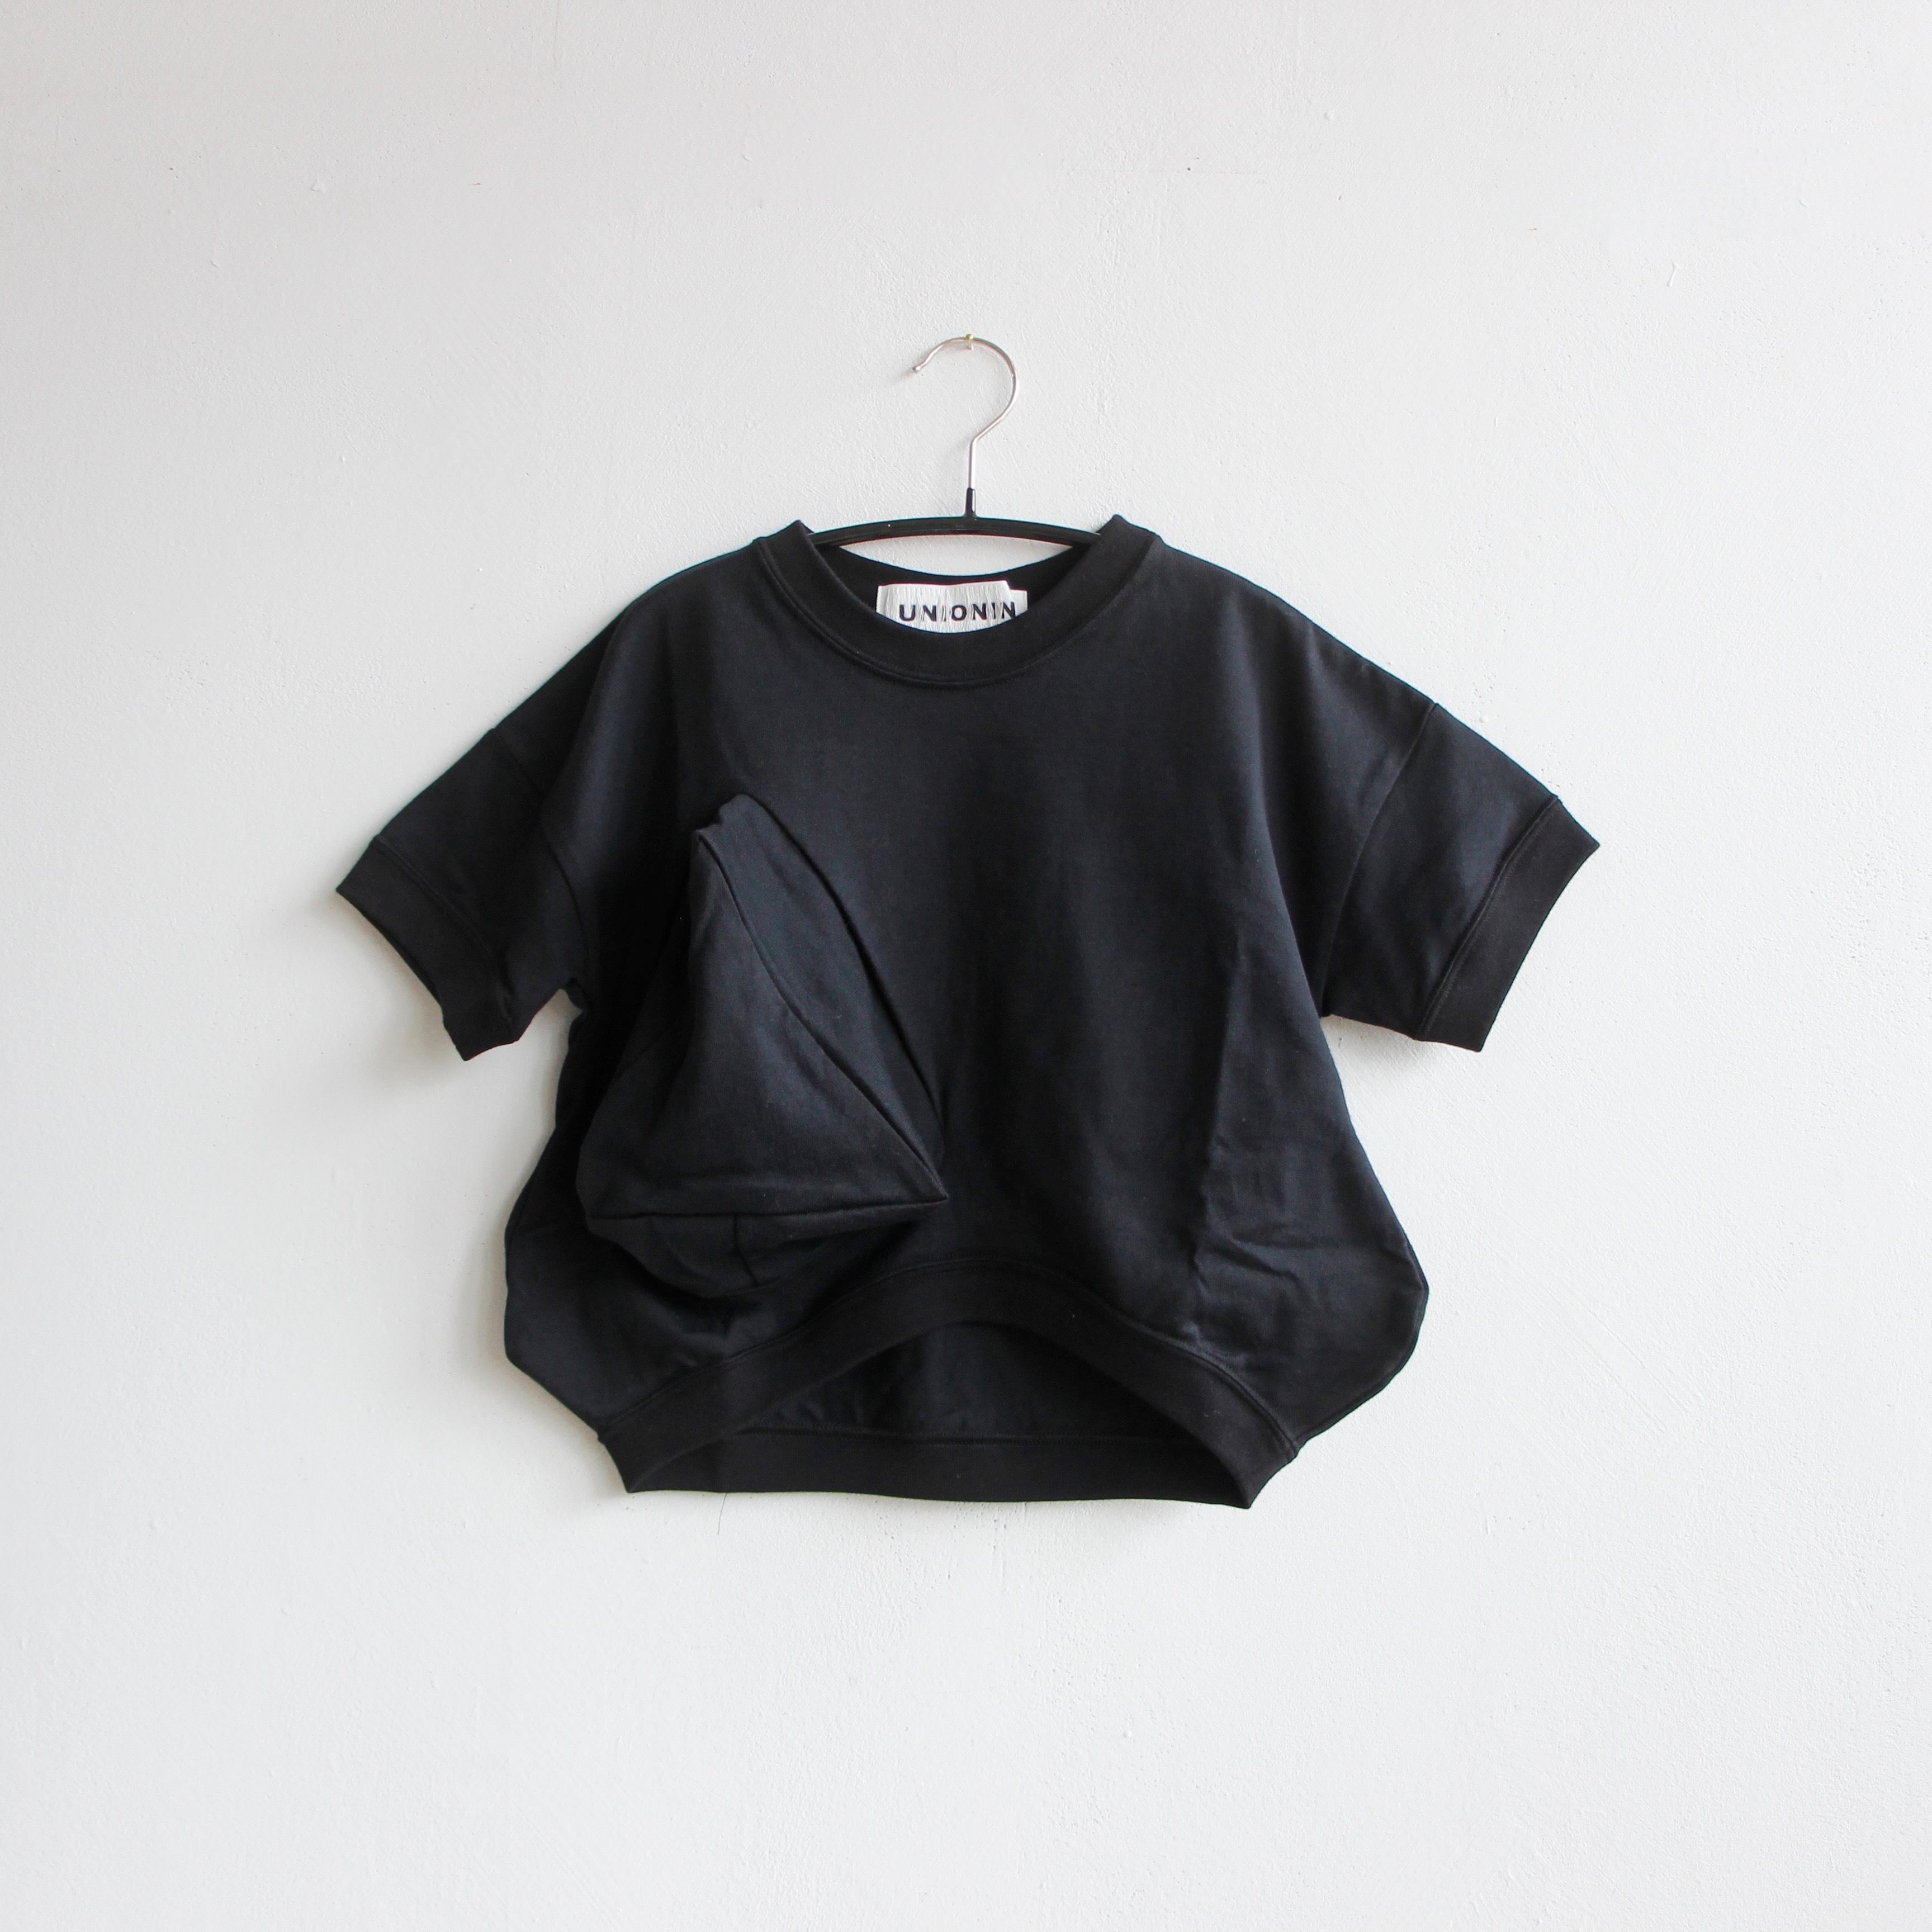 《UNIONINI 2020SS》◯△ T-shirt / black